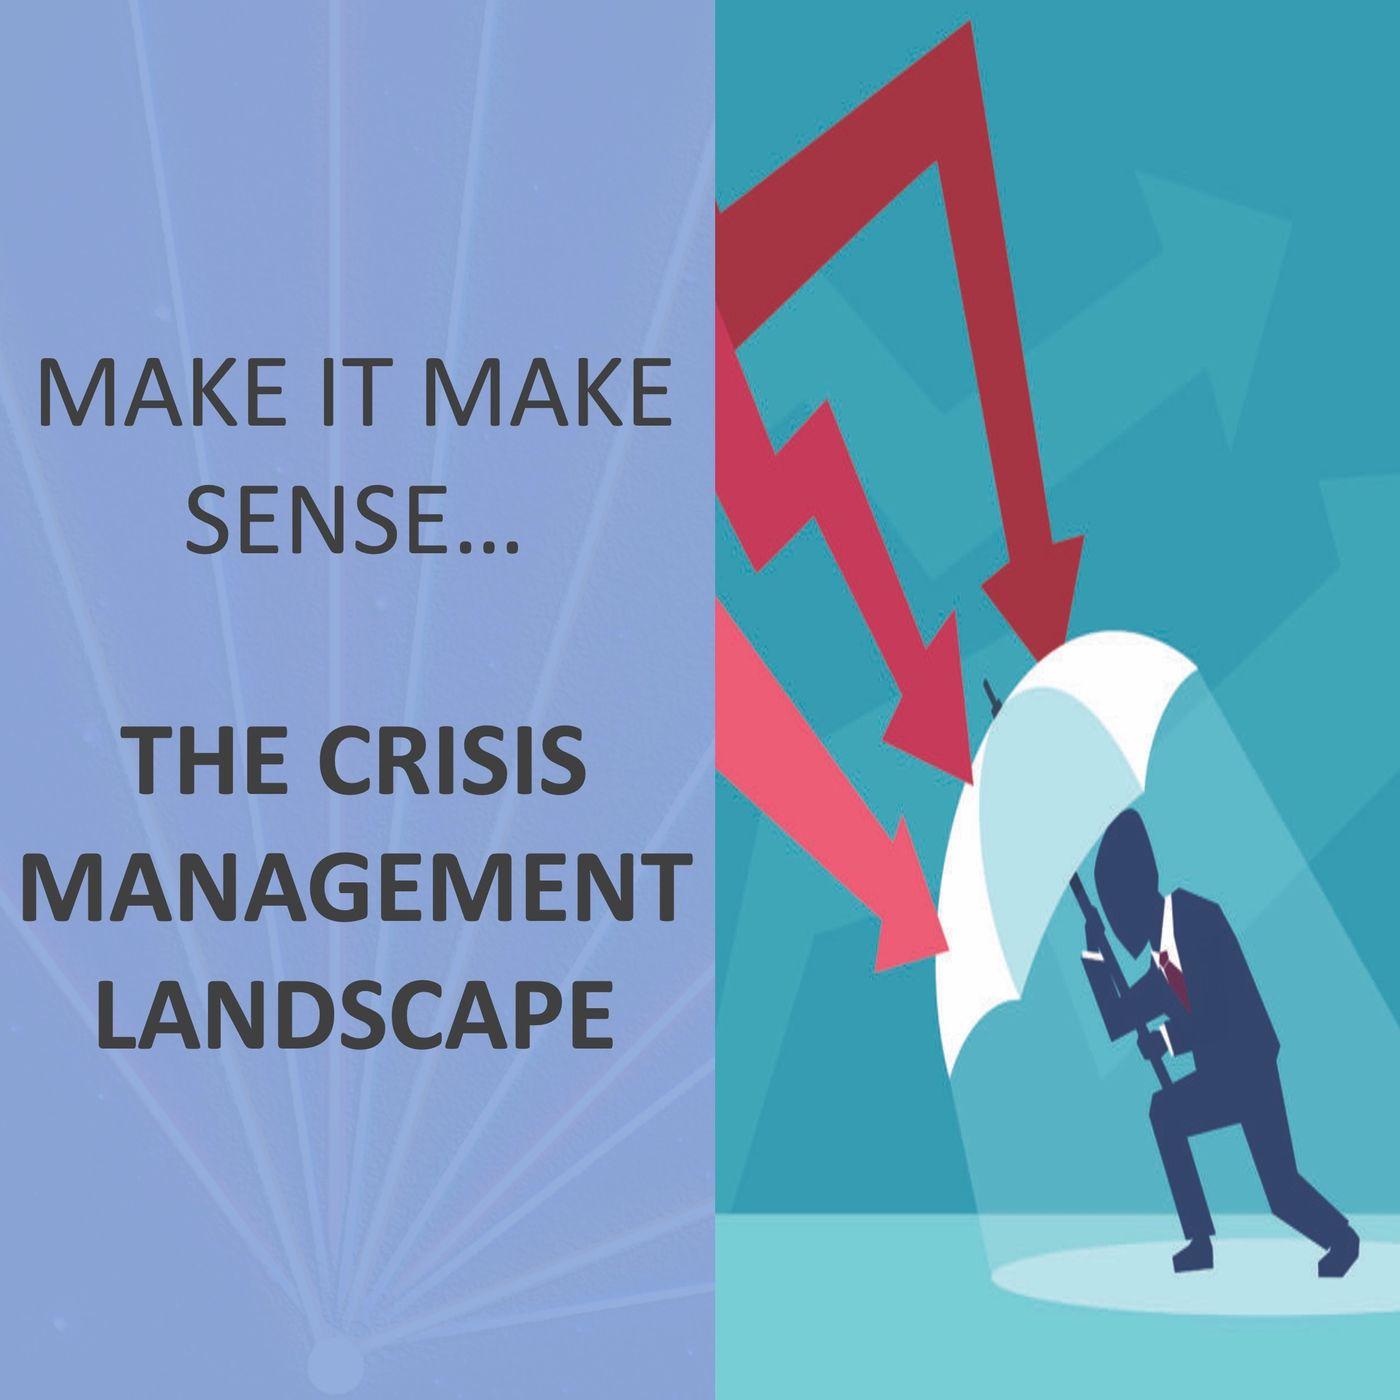 Make it make sense... The Crisis Management Landscape